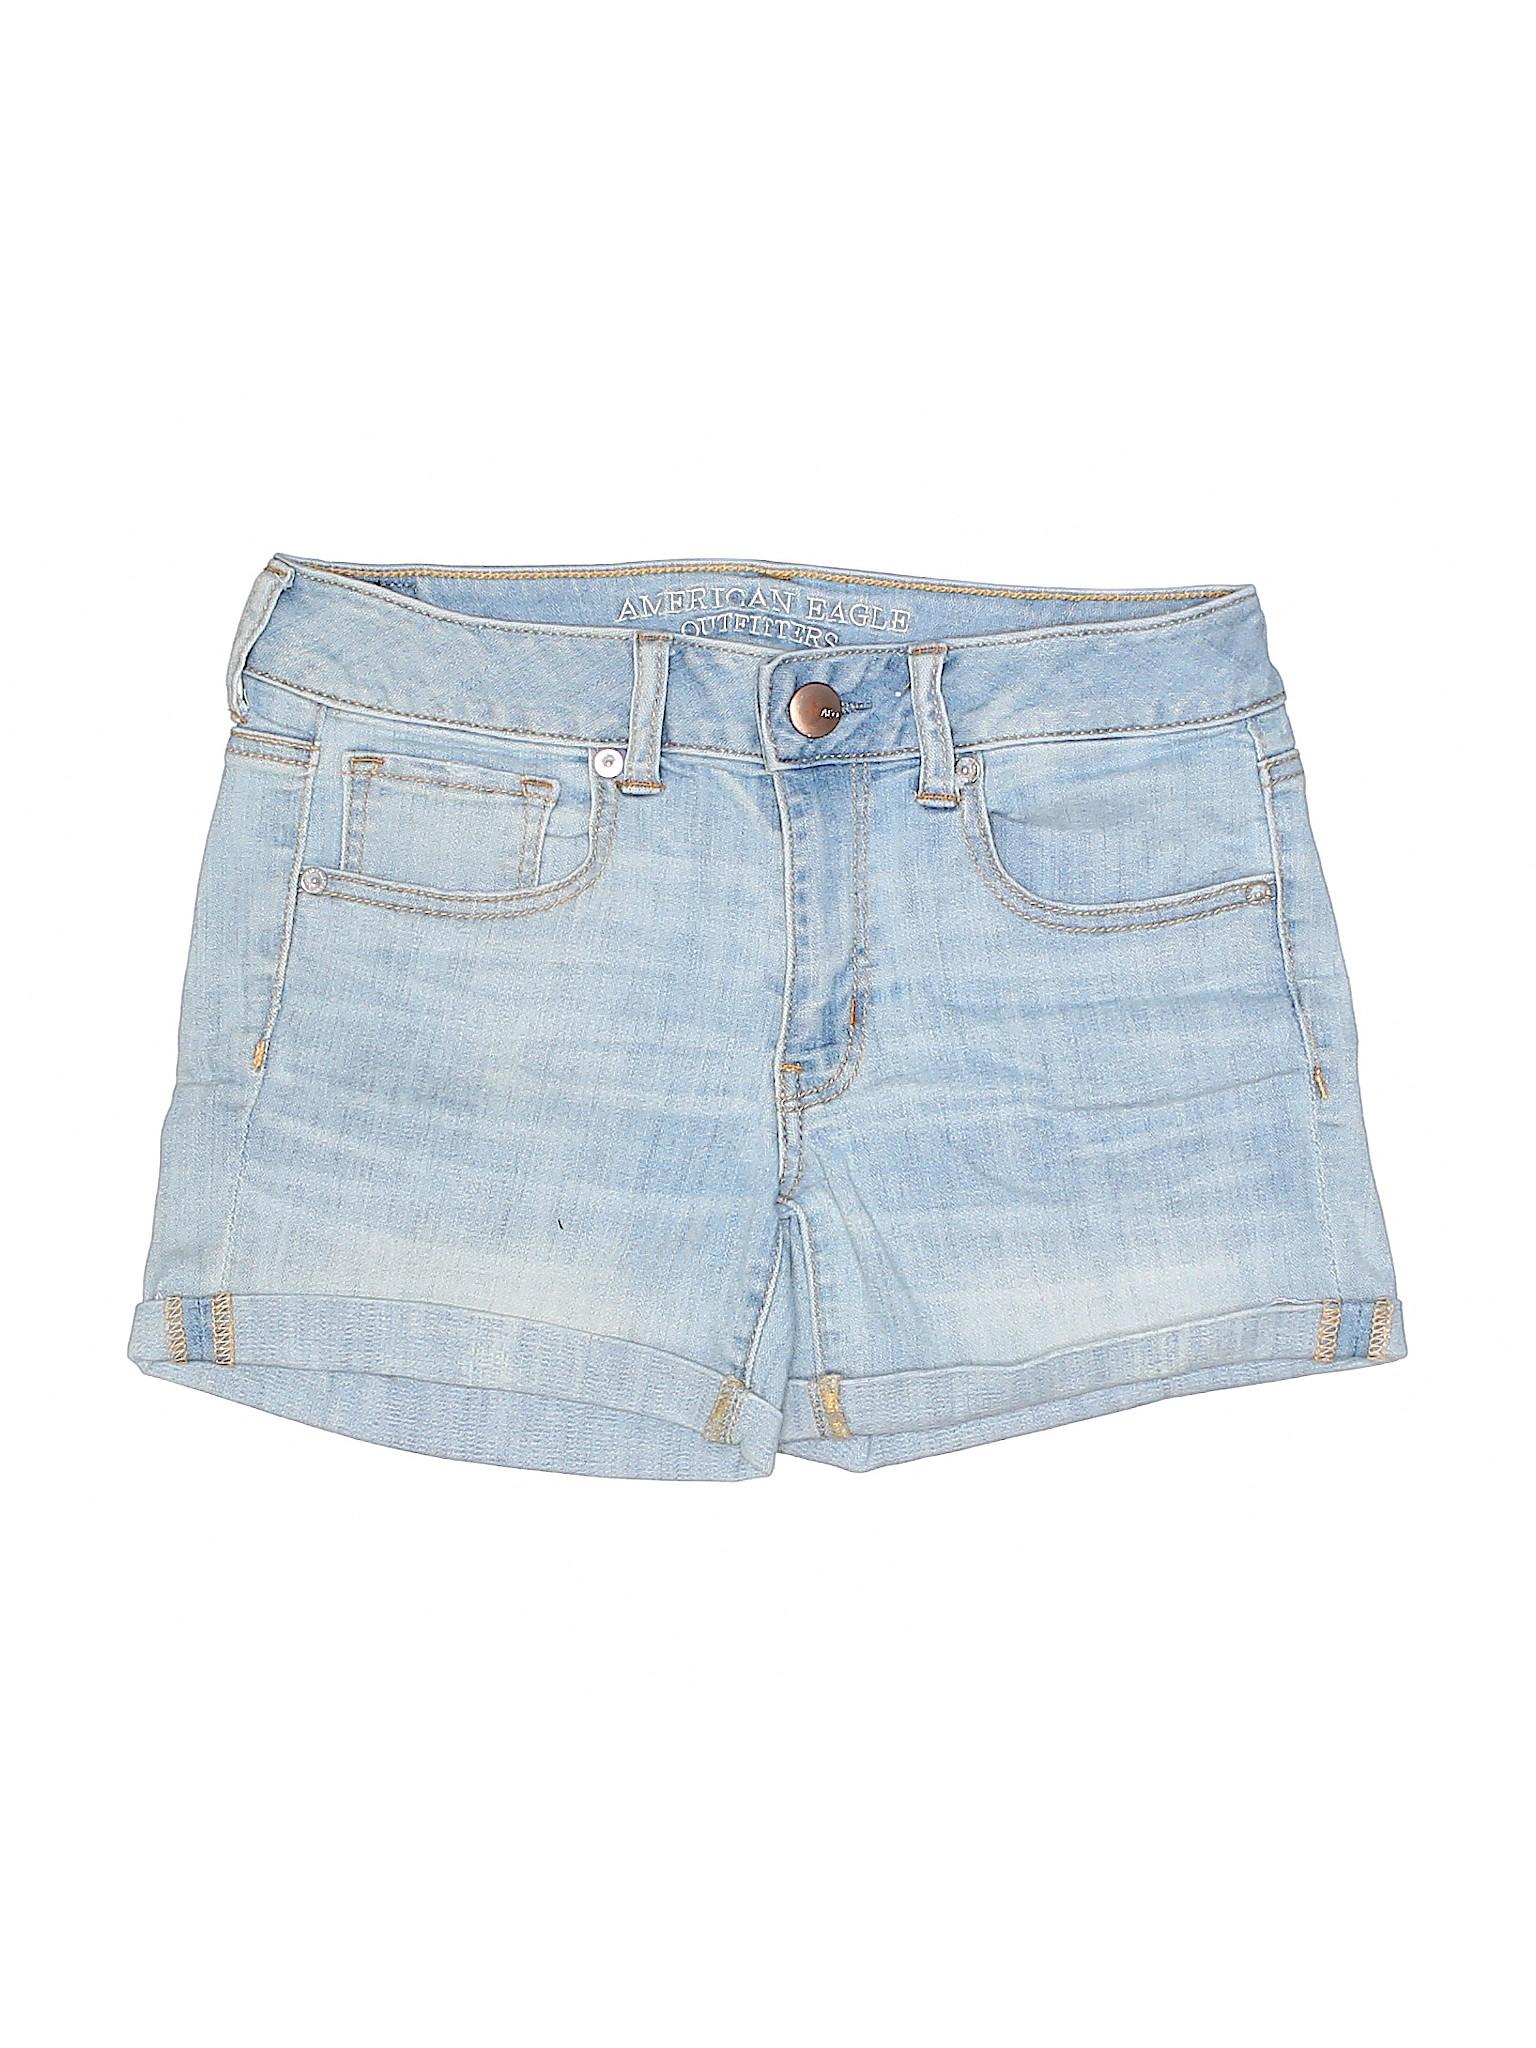 American Denim Boutique Outfitters Eagle Shorts gwq6nnA84